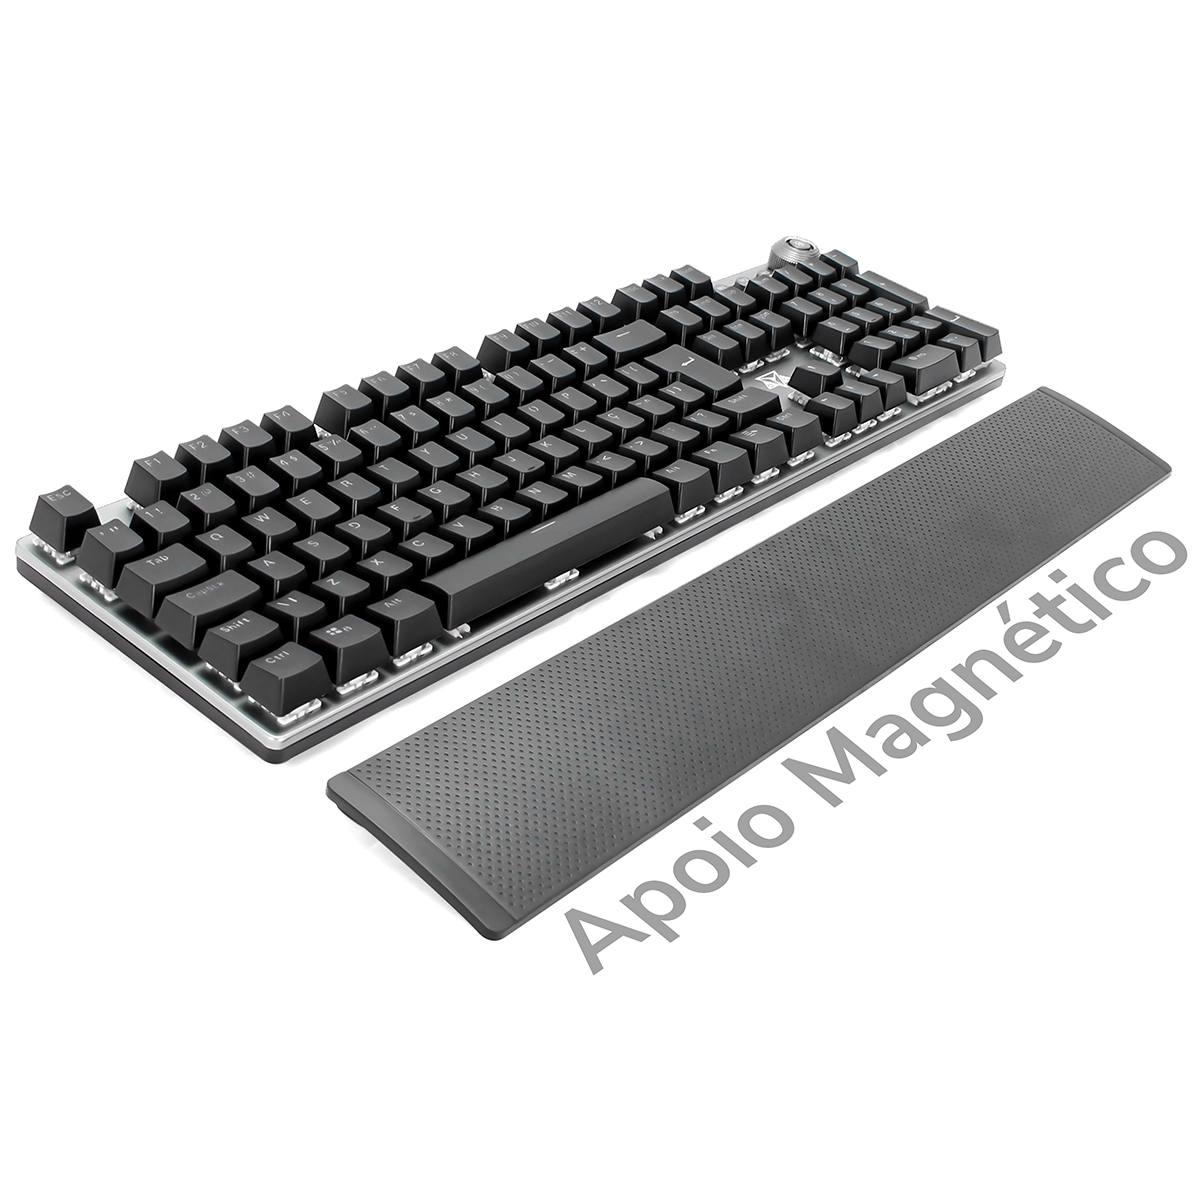 Teclado Mecânico Switch Red KRGD Full Anti-Ghosting Macro e Software Modo Gamer LED ABNT2 Adamantiun Karambit AK-2000V